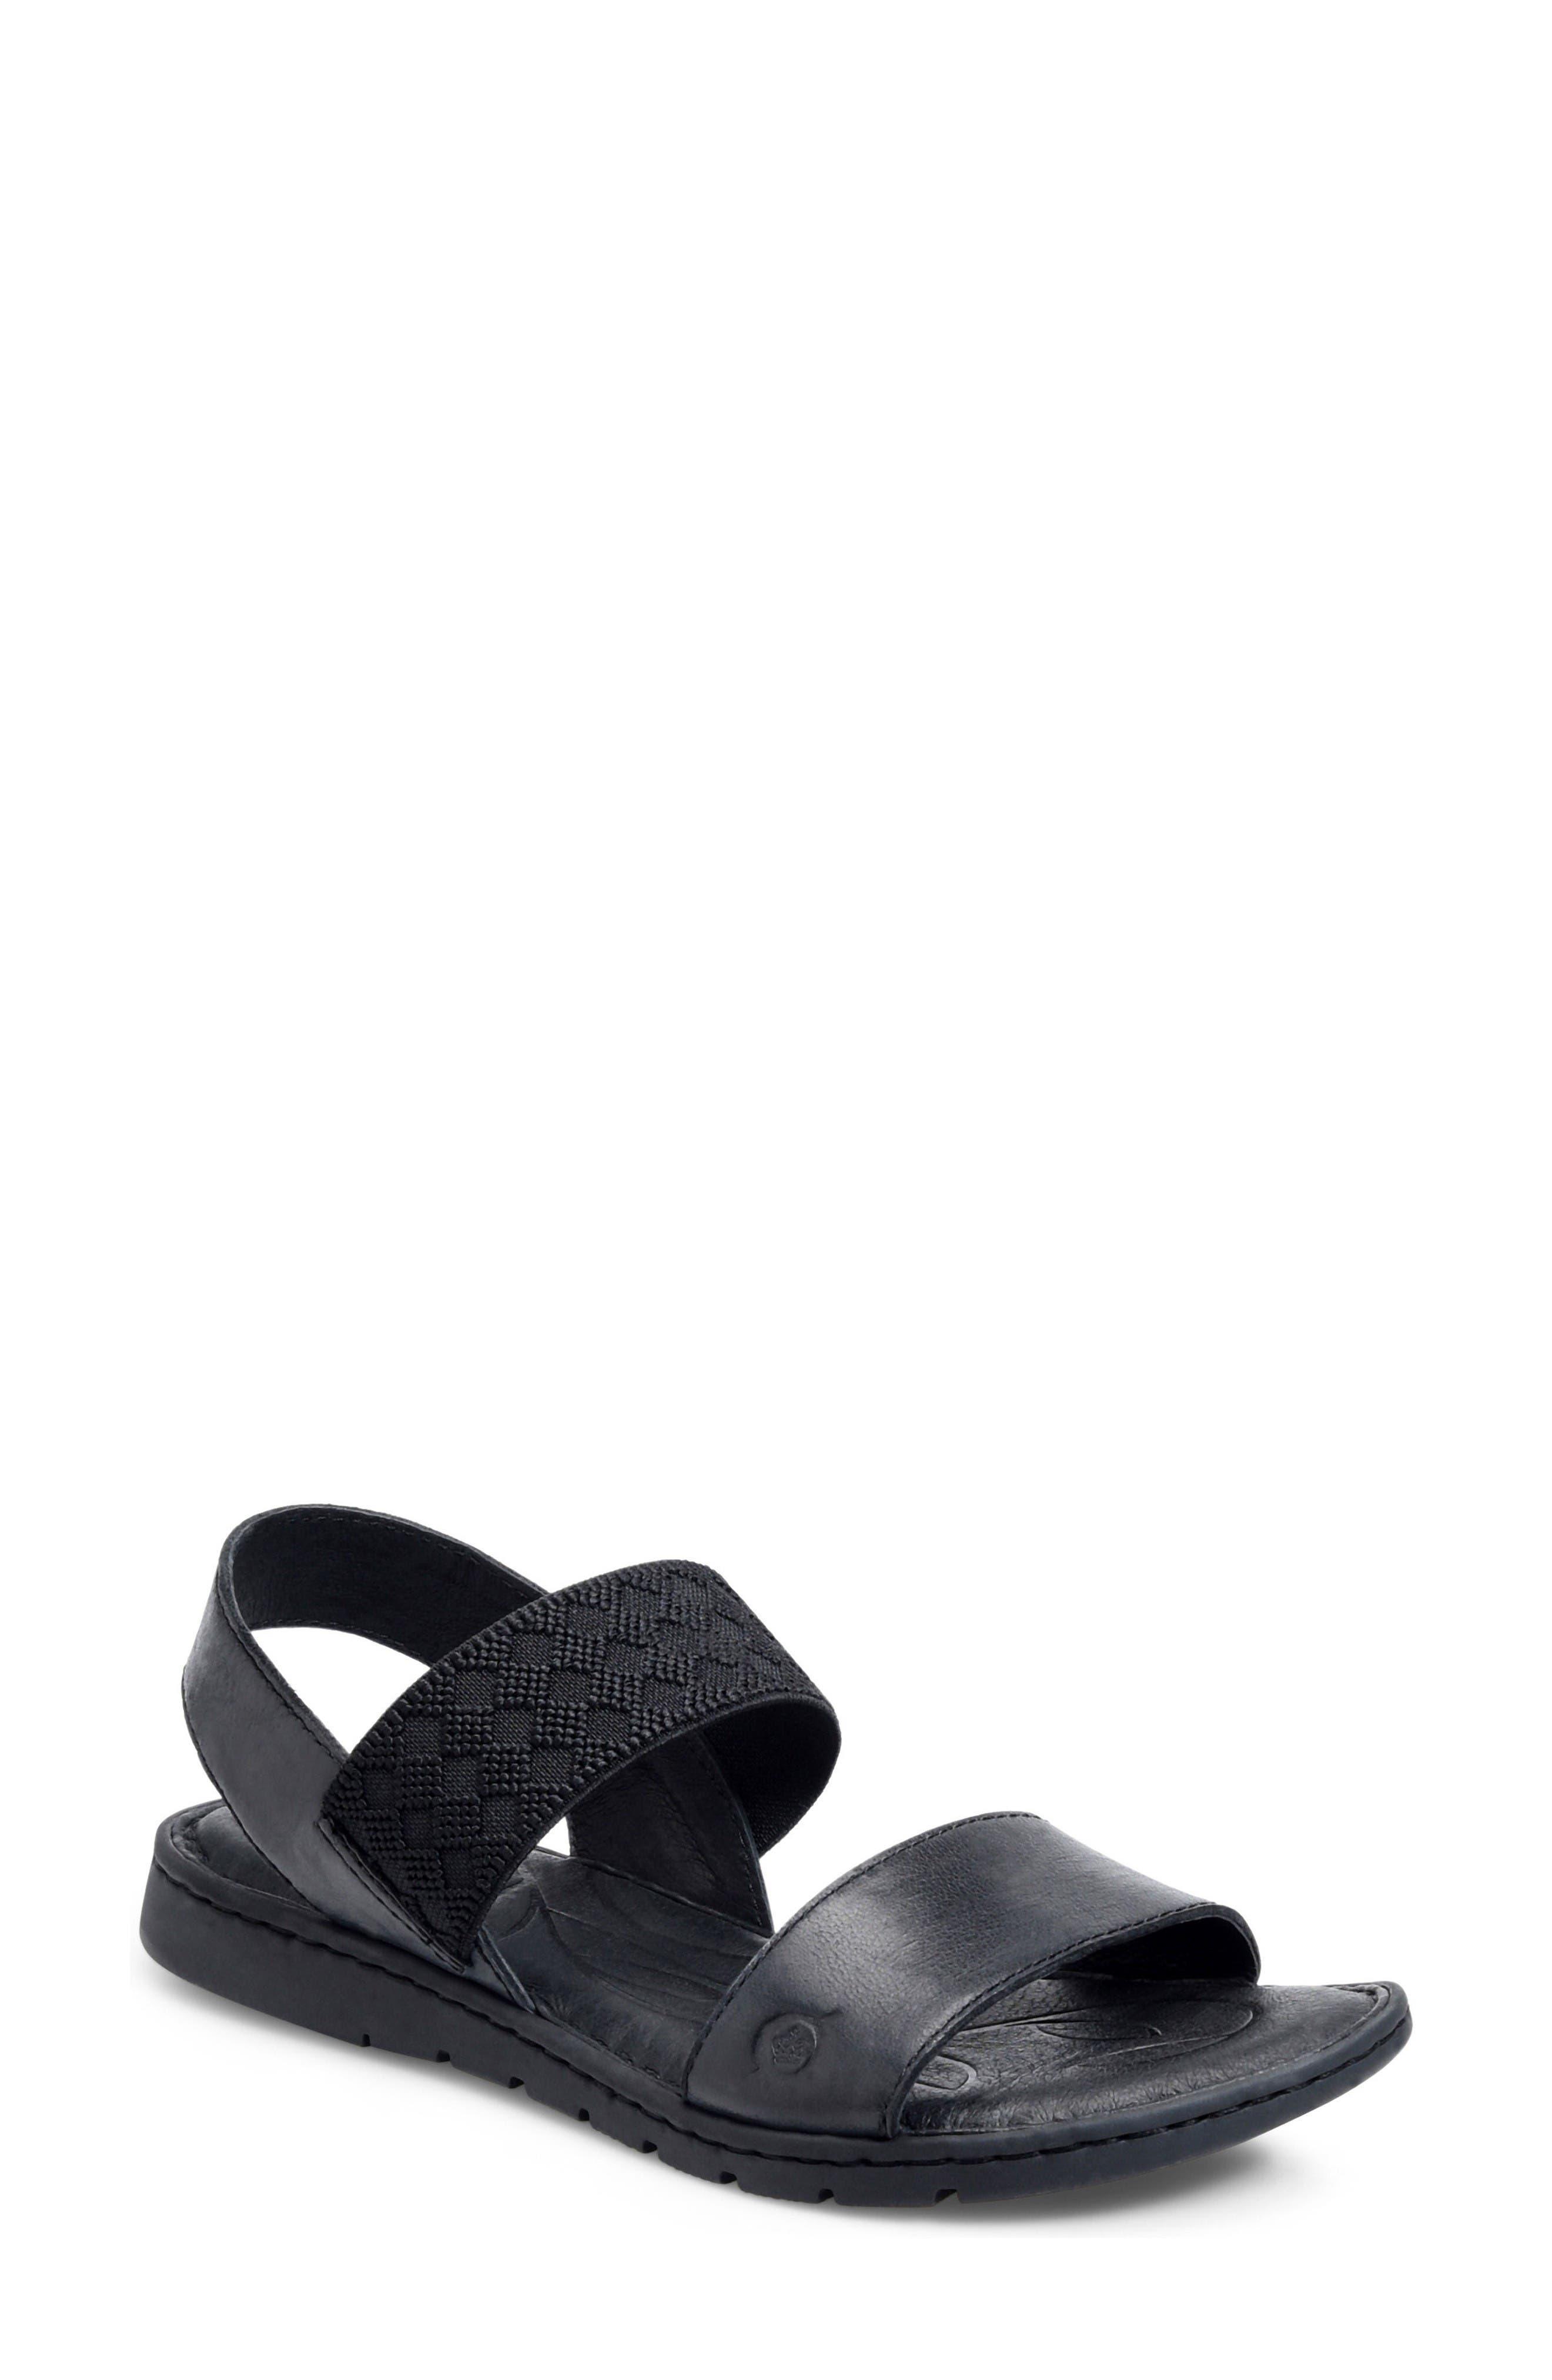 Main Image - Børn Parsons Sandal (Women)